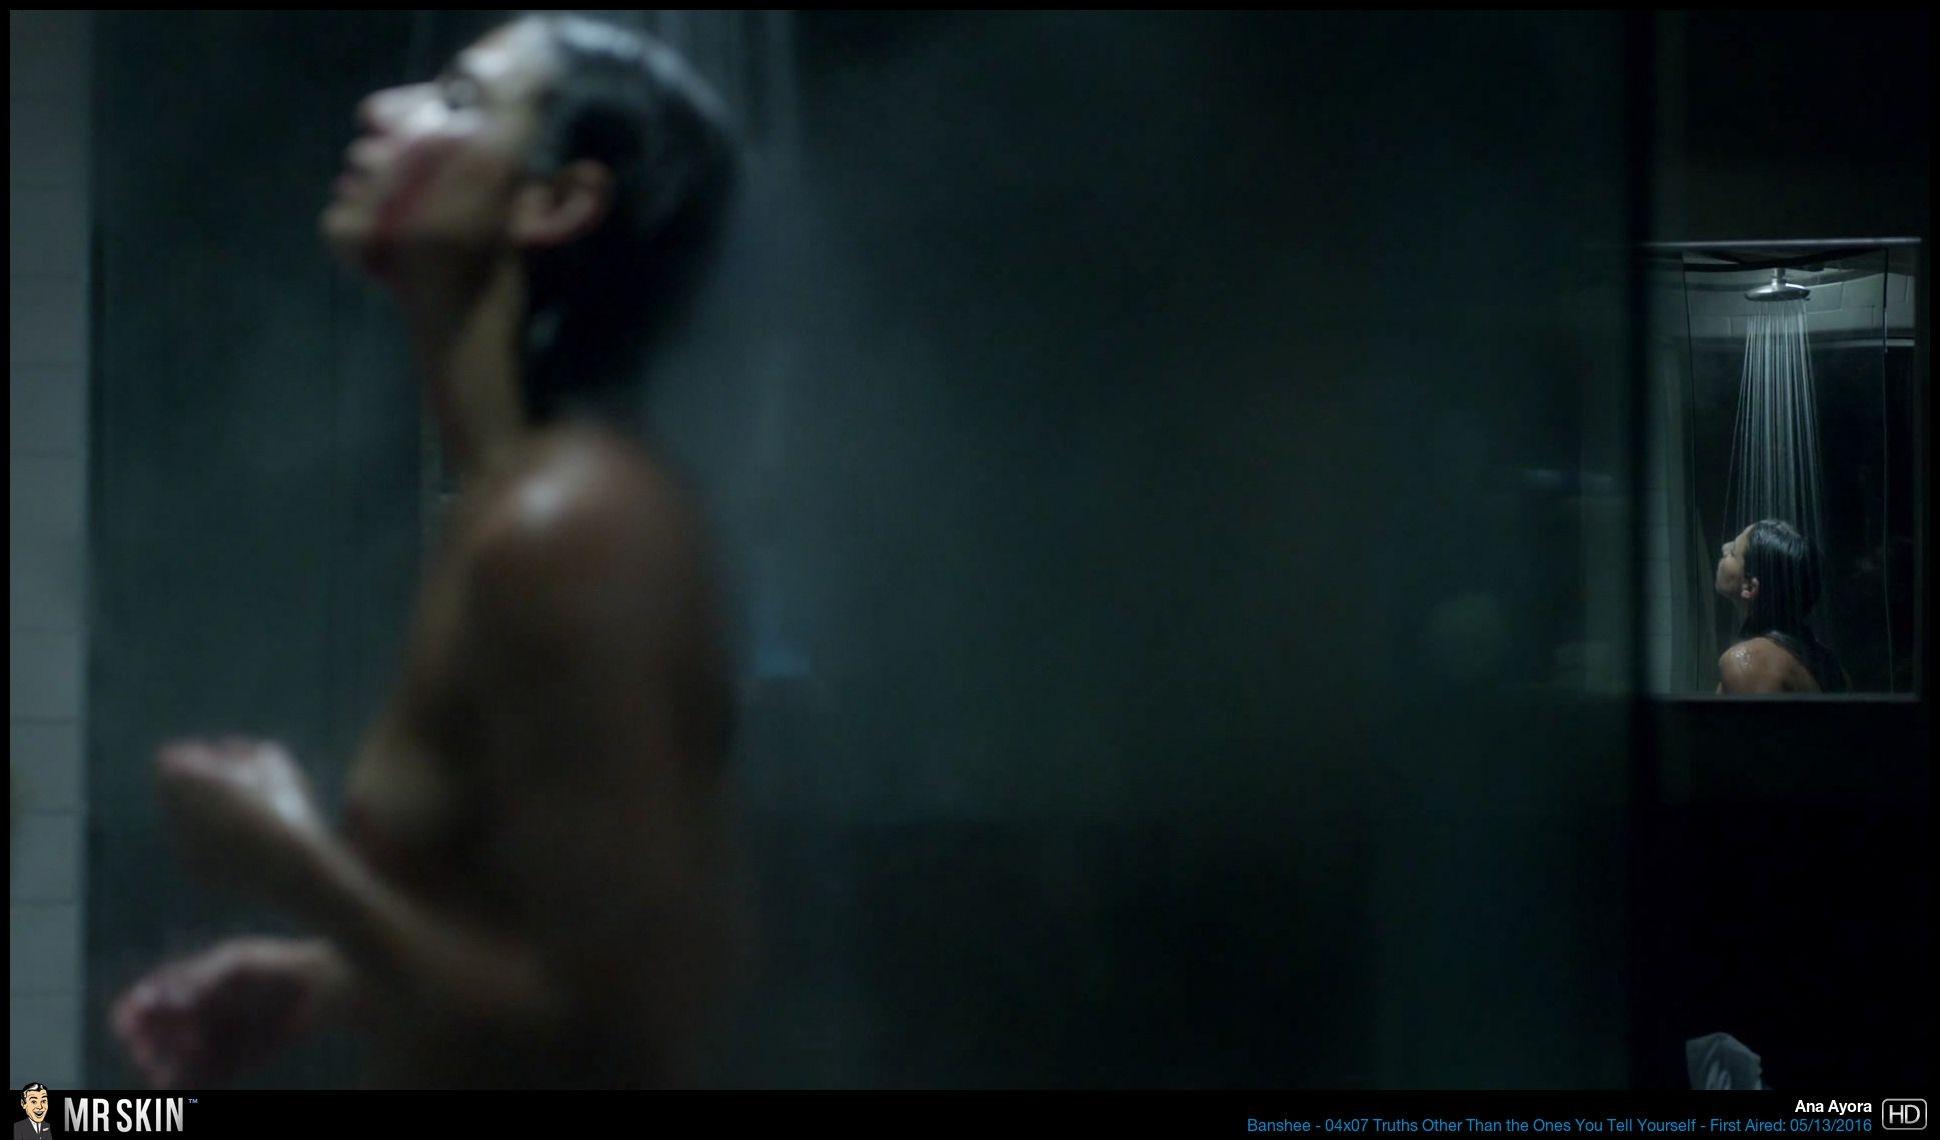 Ana Ayora Nude ana ayora nude, naked - pics and videos - imperiodefamosas